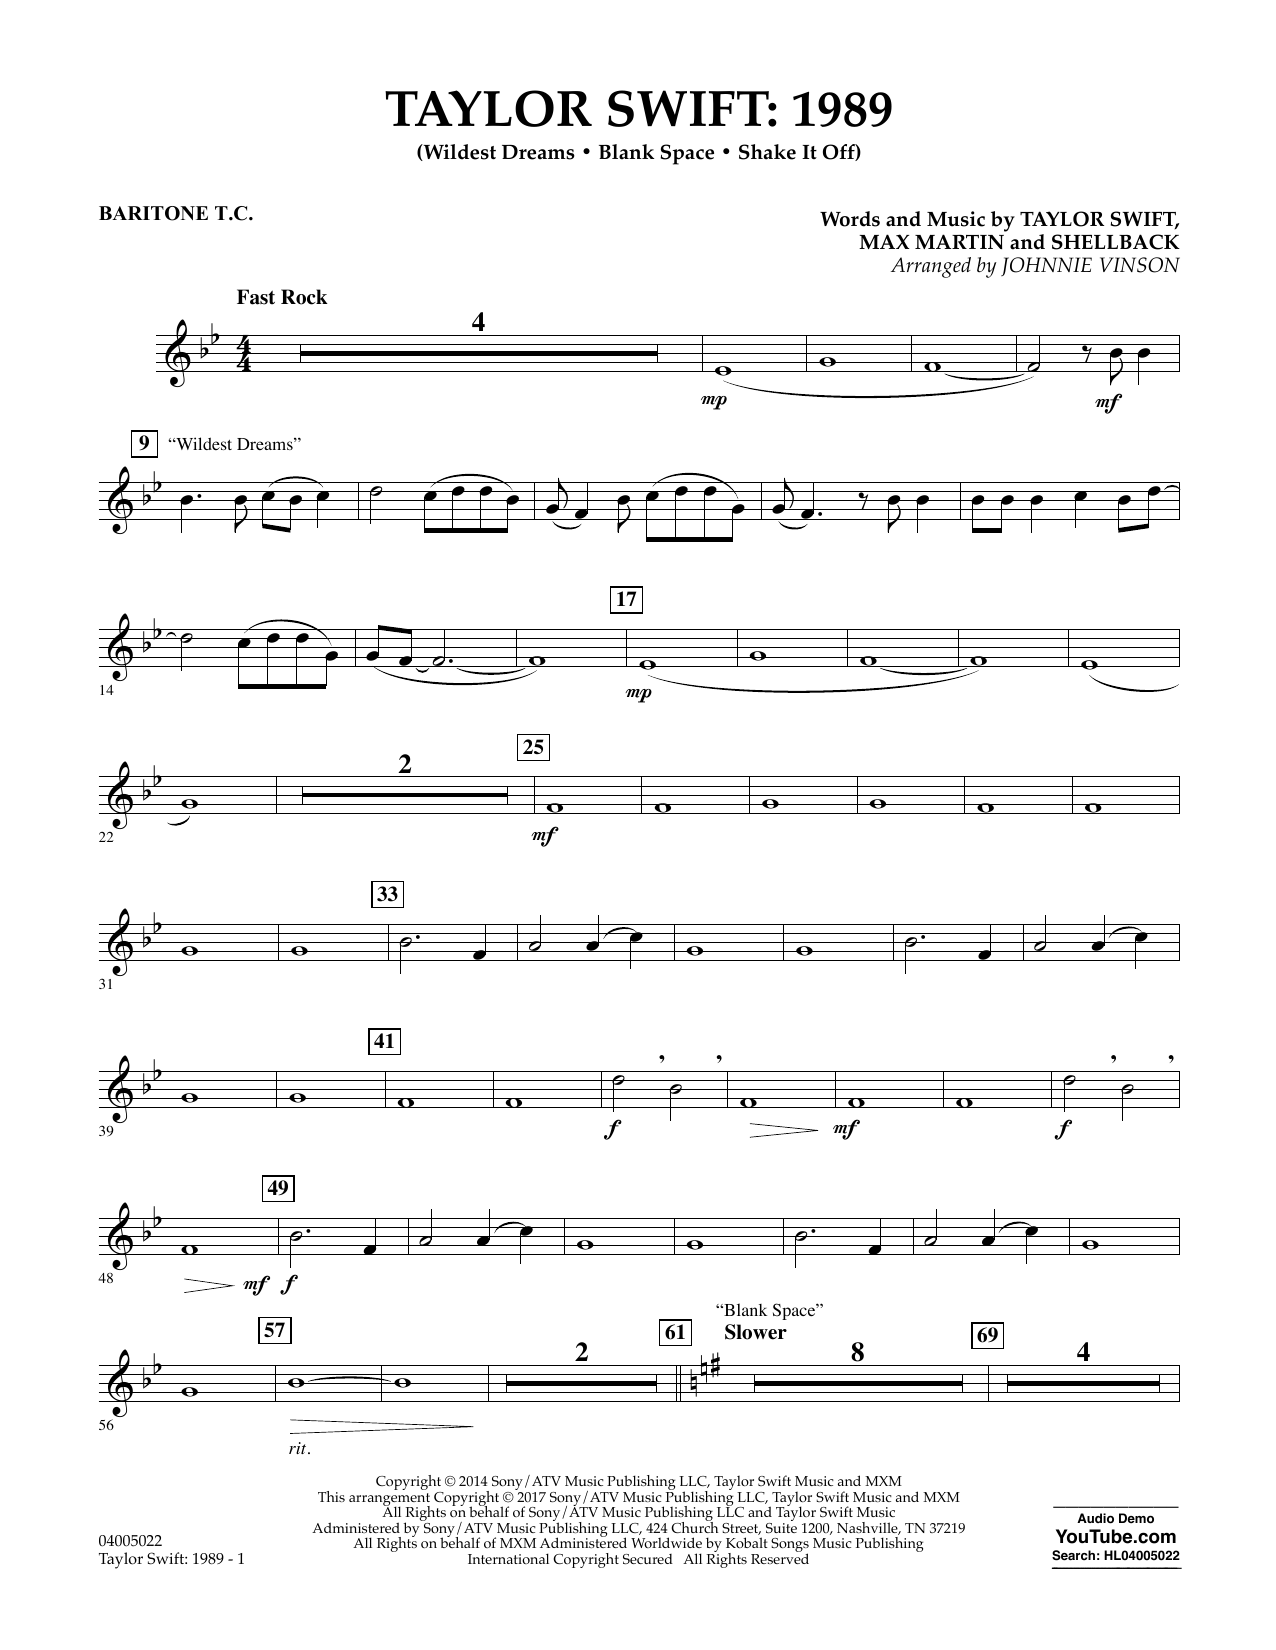 Taylor Swift: 1989 - Baritone T.C. Sheet Music